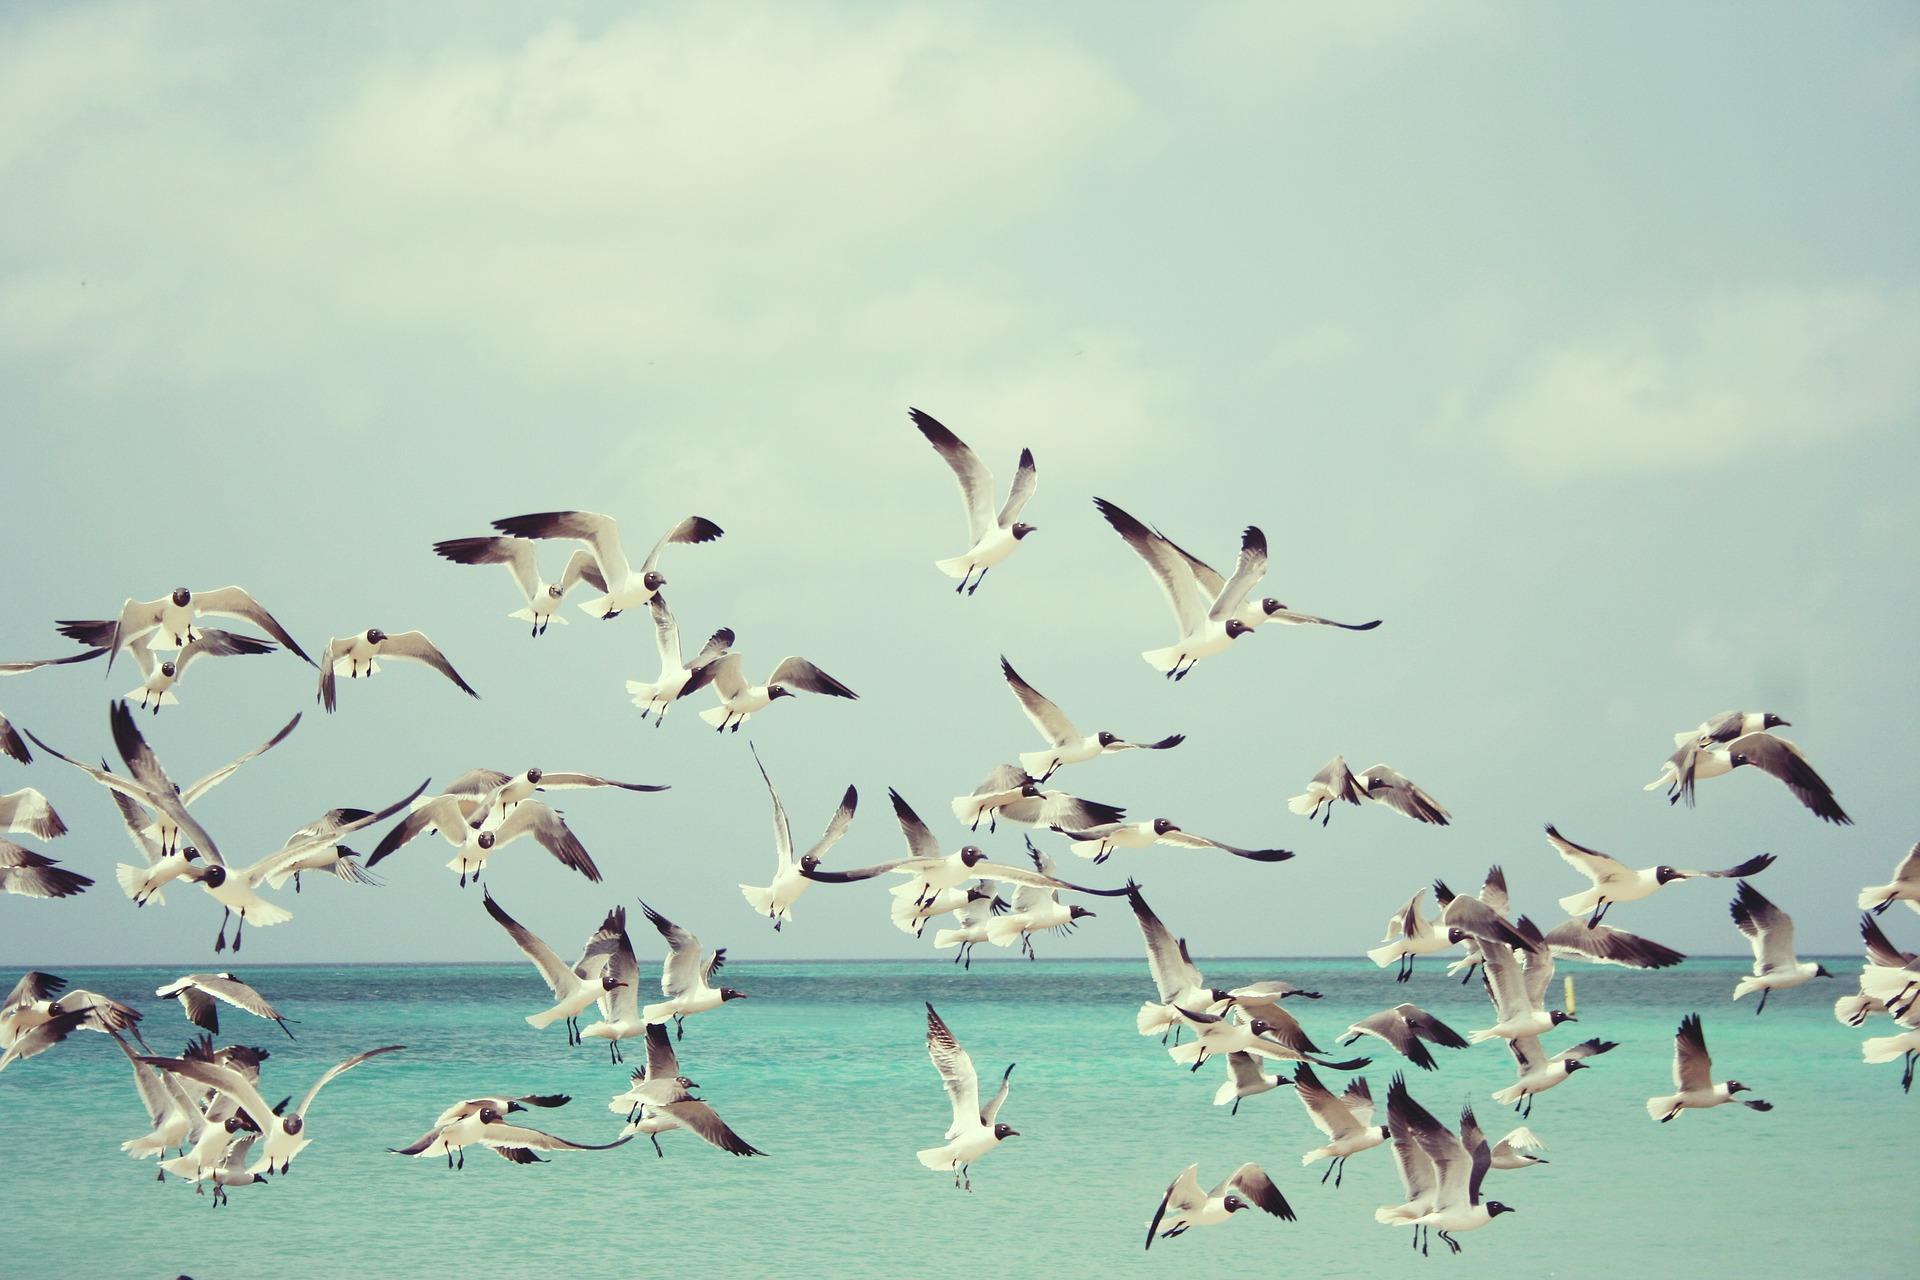 seagulls-815304_1920